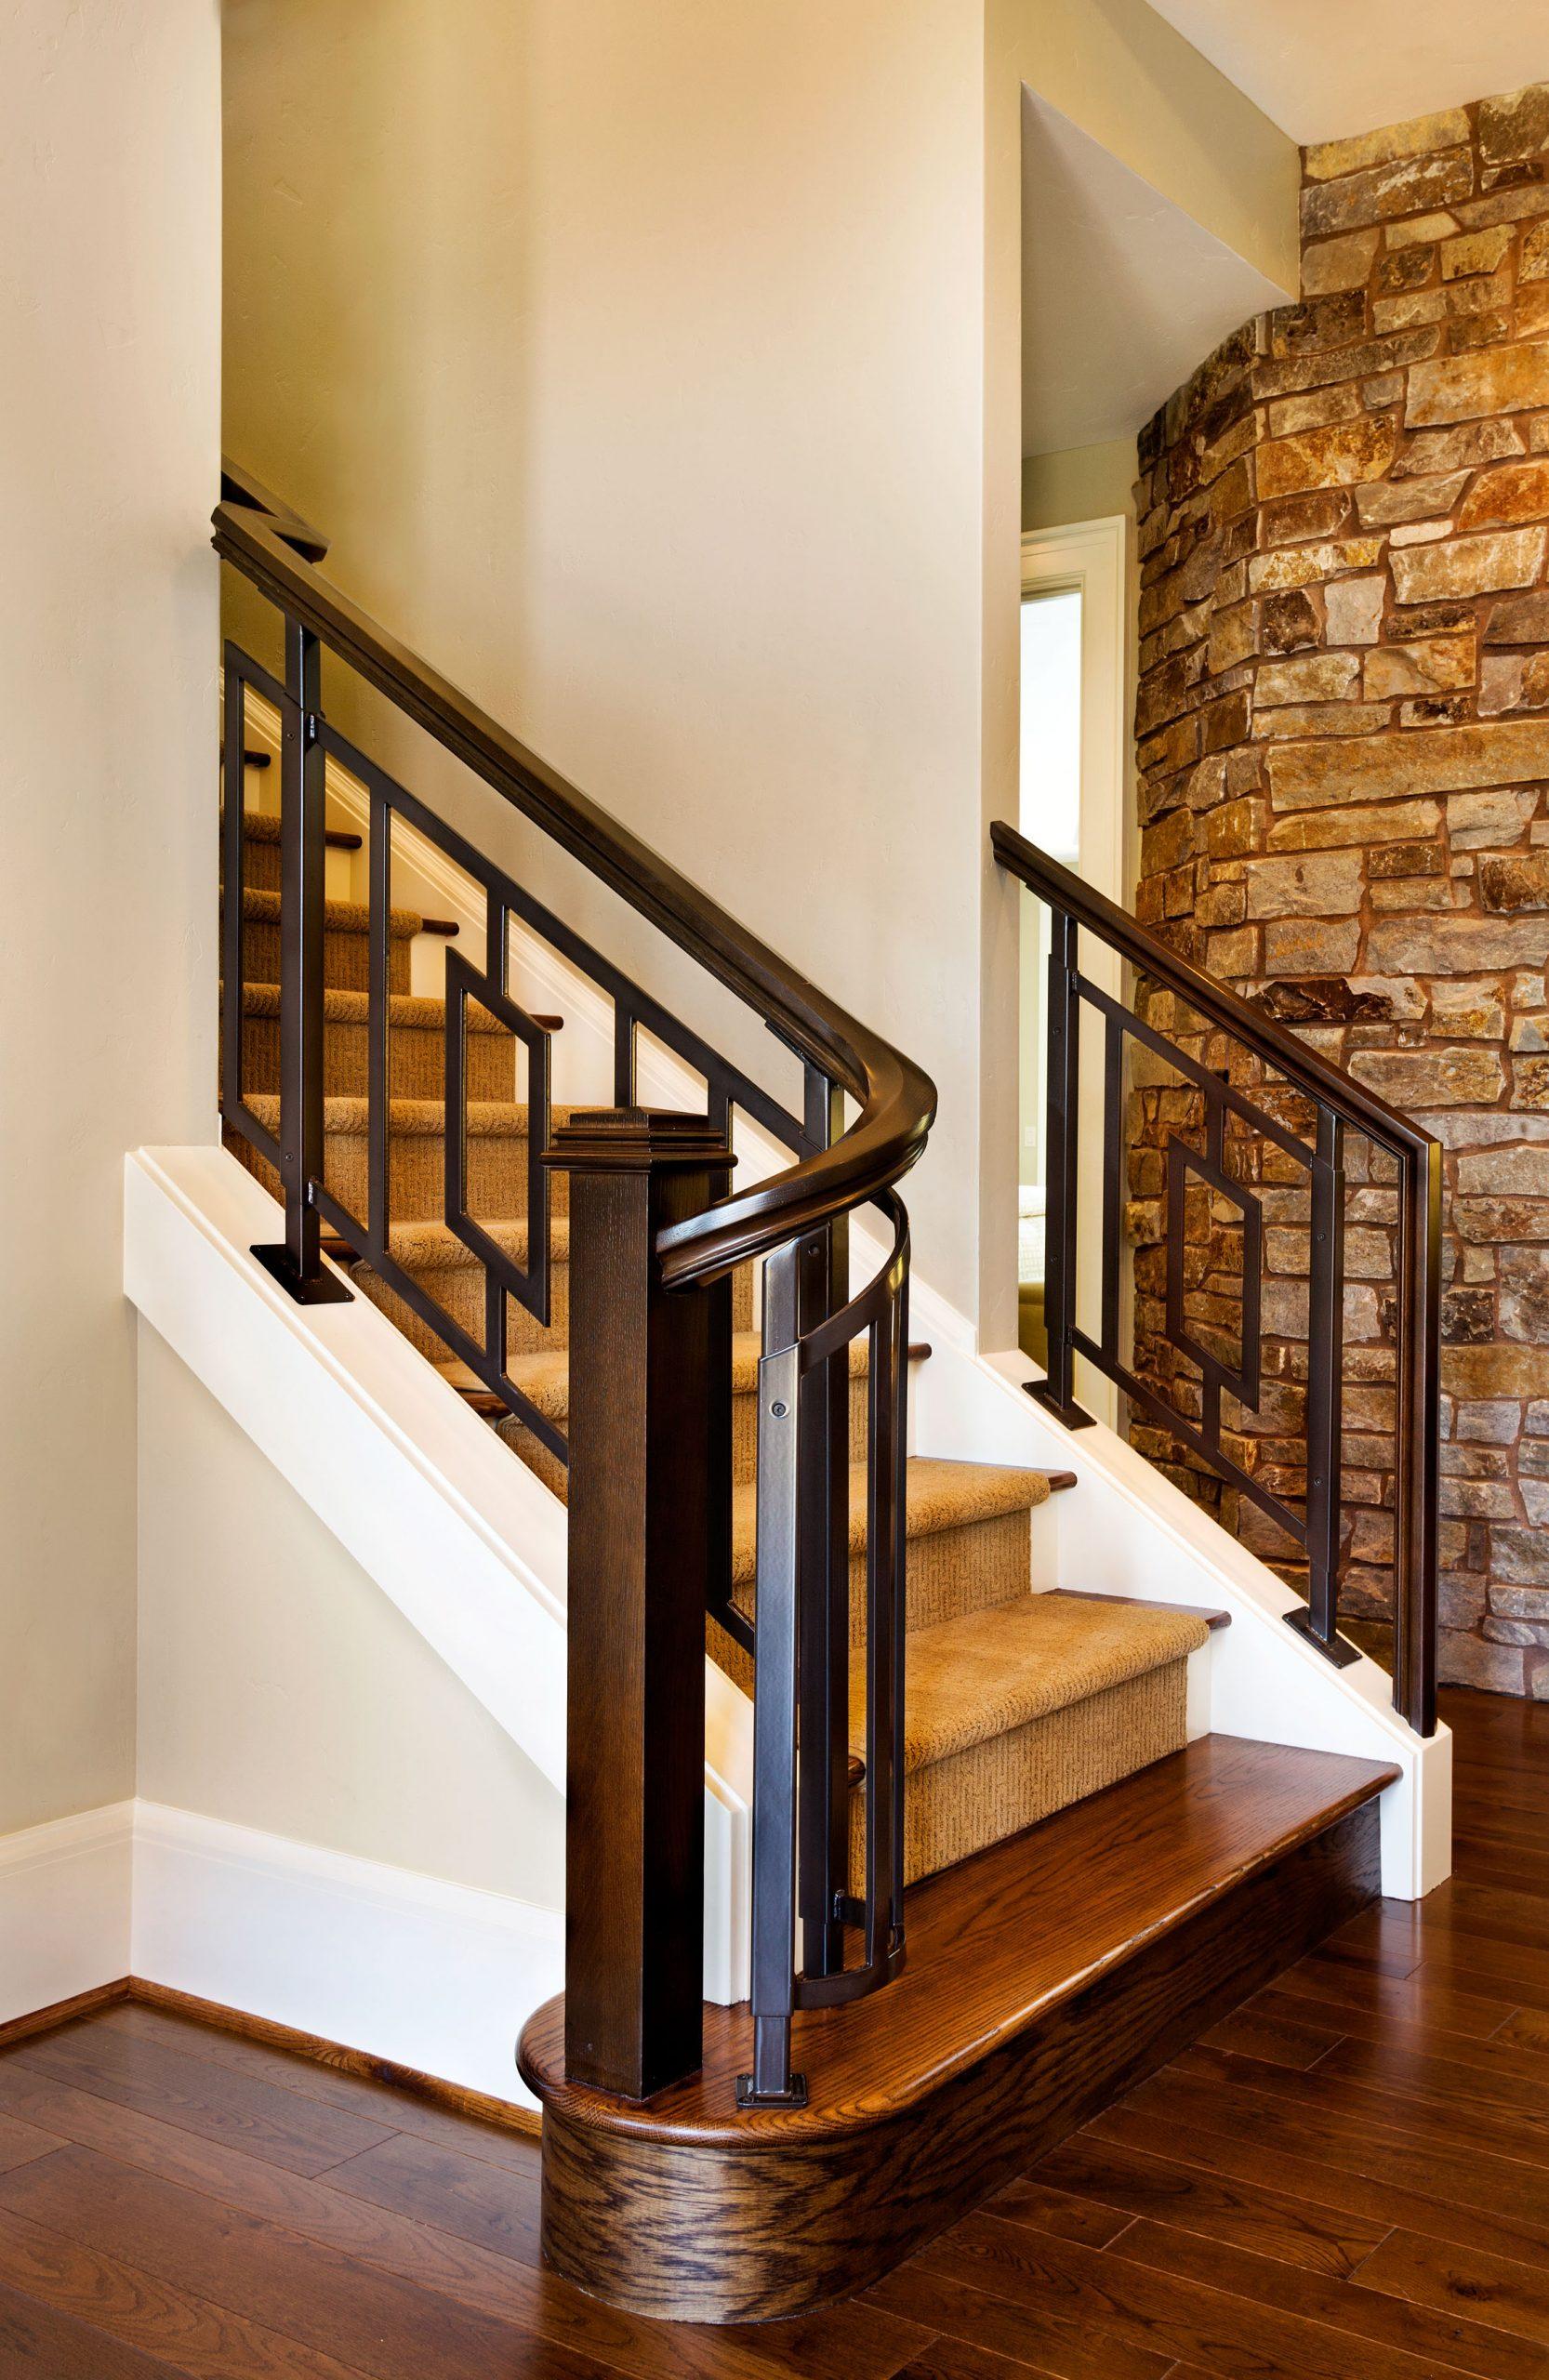 mw design workshop custom stairs handrail